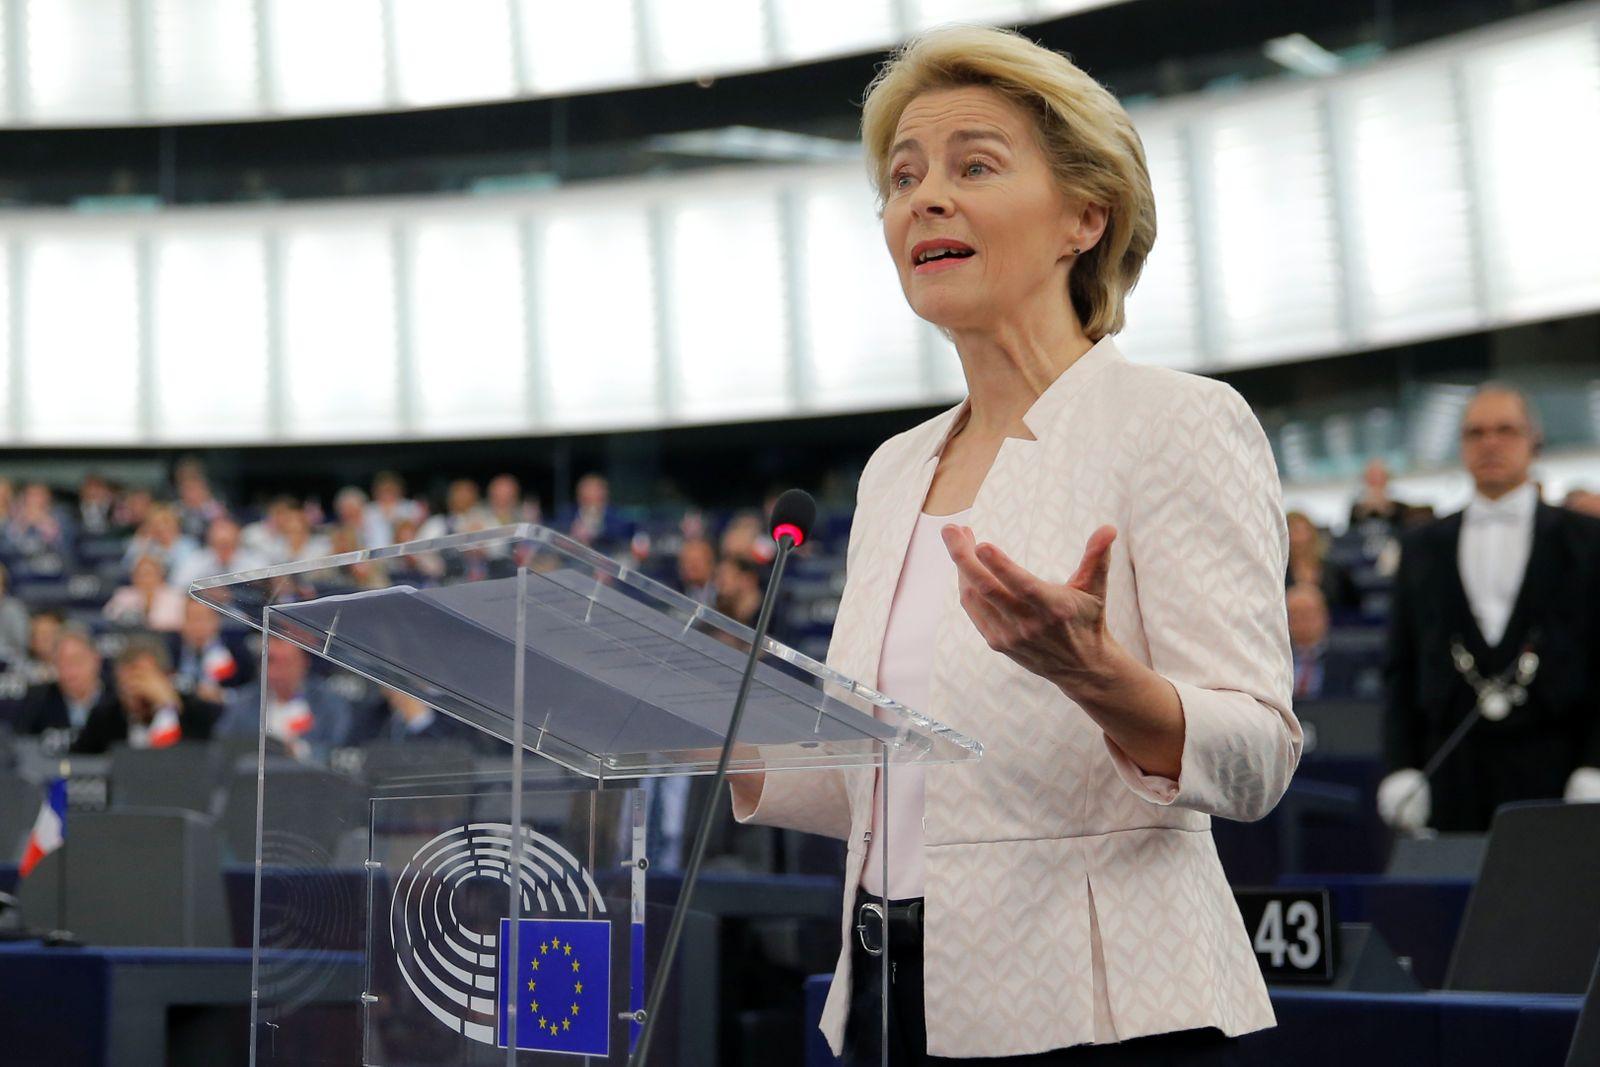 Designated European Commission President von der Leyen delivers a speech during a debate on her election at the European Parliament in Strasbourg